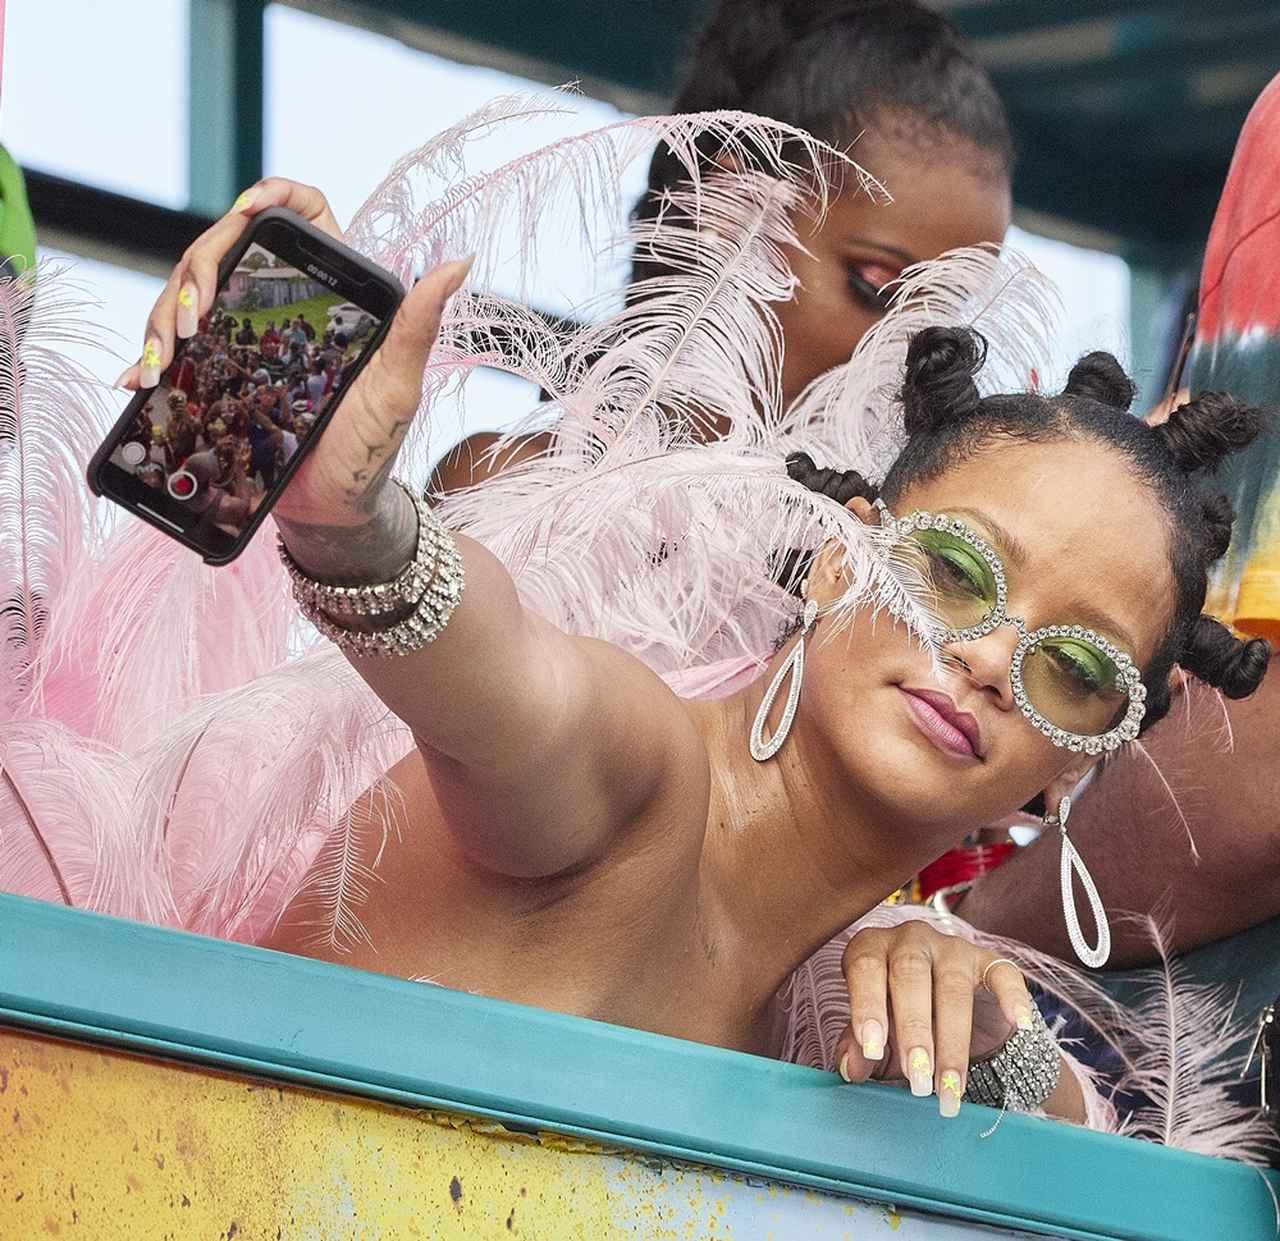 Images : 12番目の画像 - リアーナ、恒例の収穫祭に出席!18禁レベルの衣装が注目されるが今年は? - フロントロウ -海外セレブ情報を発信